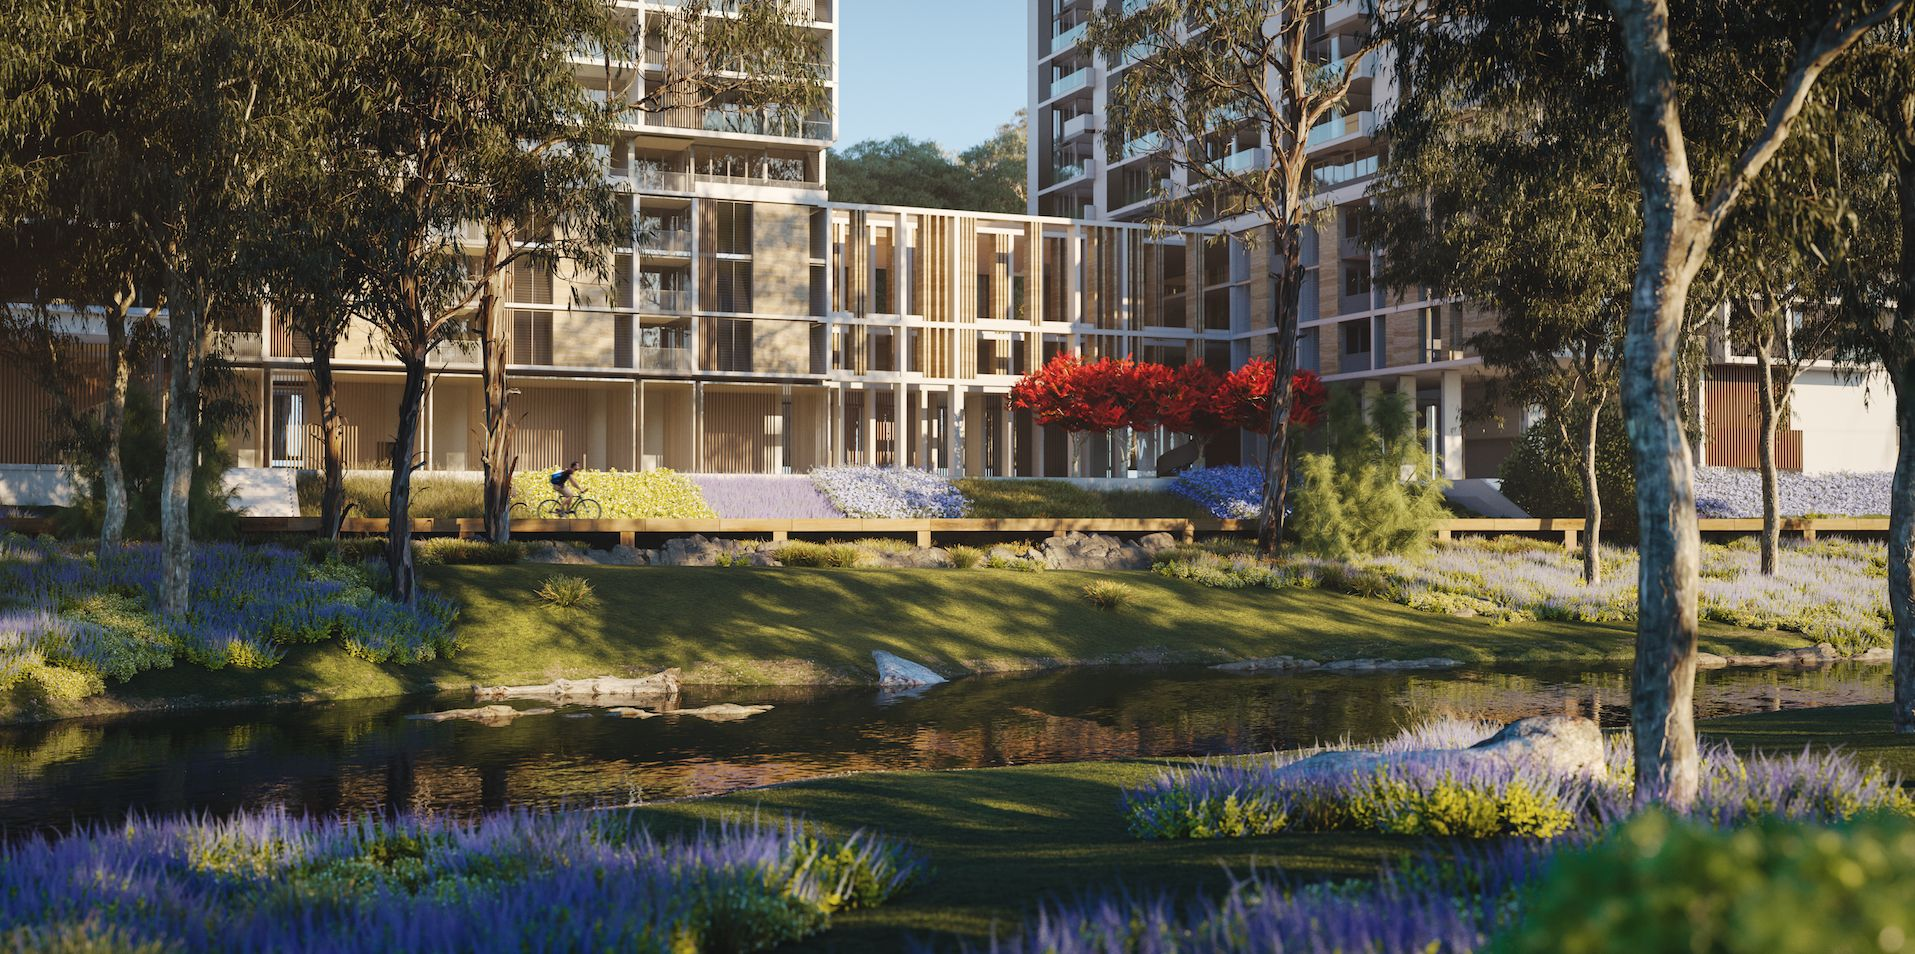 82 Waterloo Road, Macquarie Park, NSW 2113, Image 0